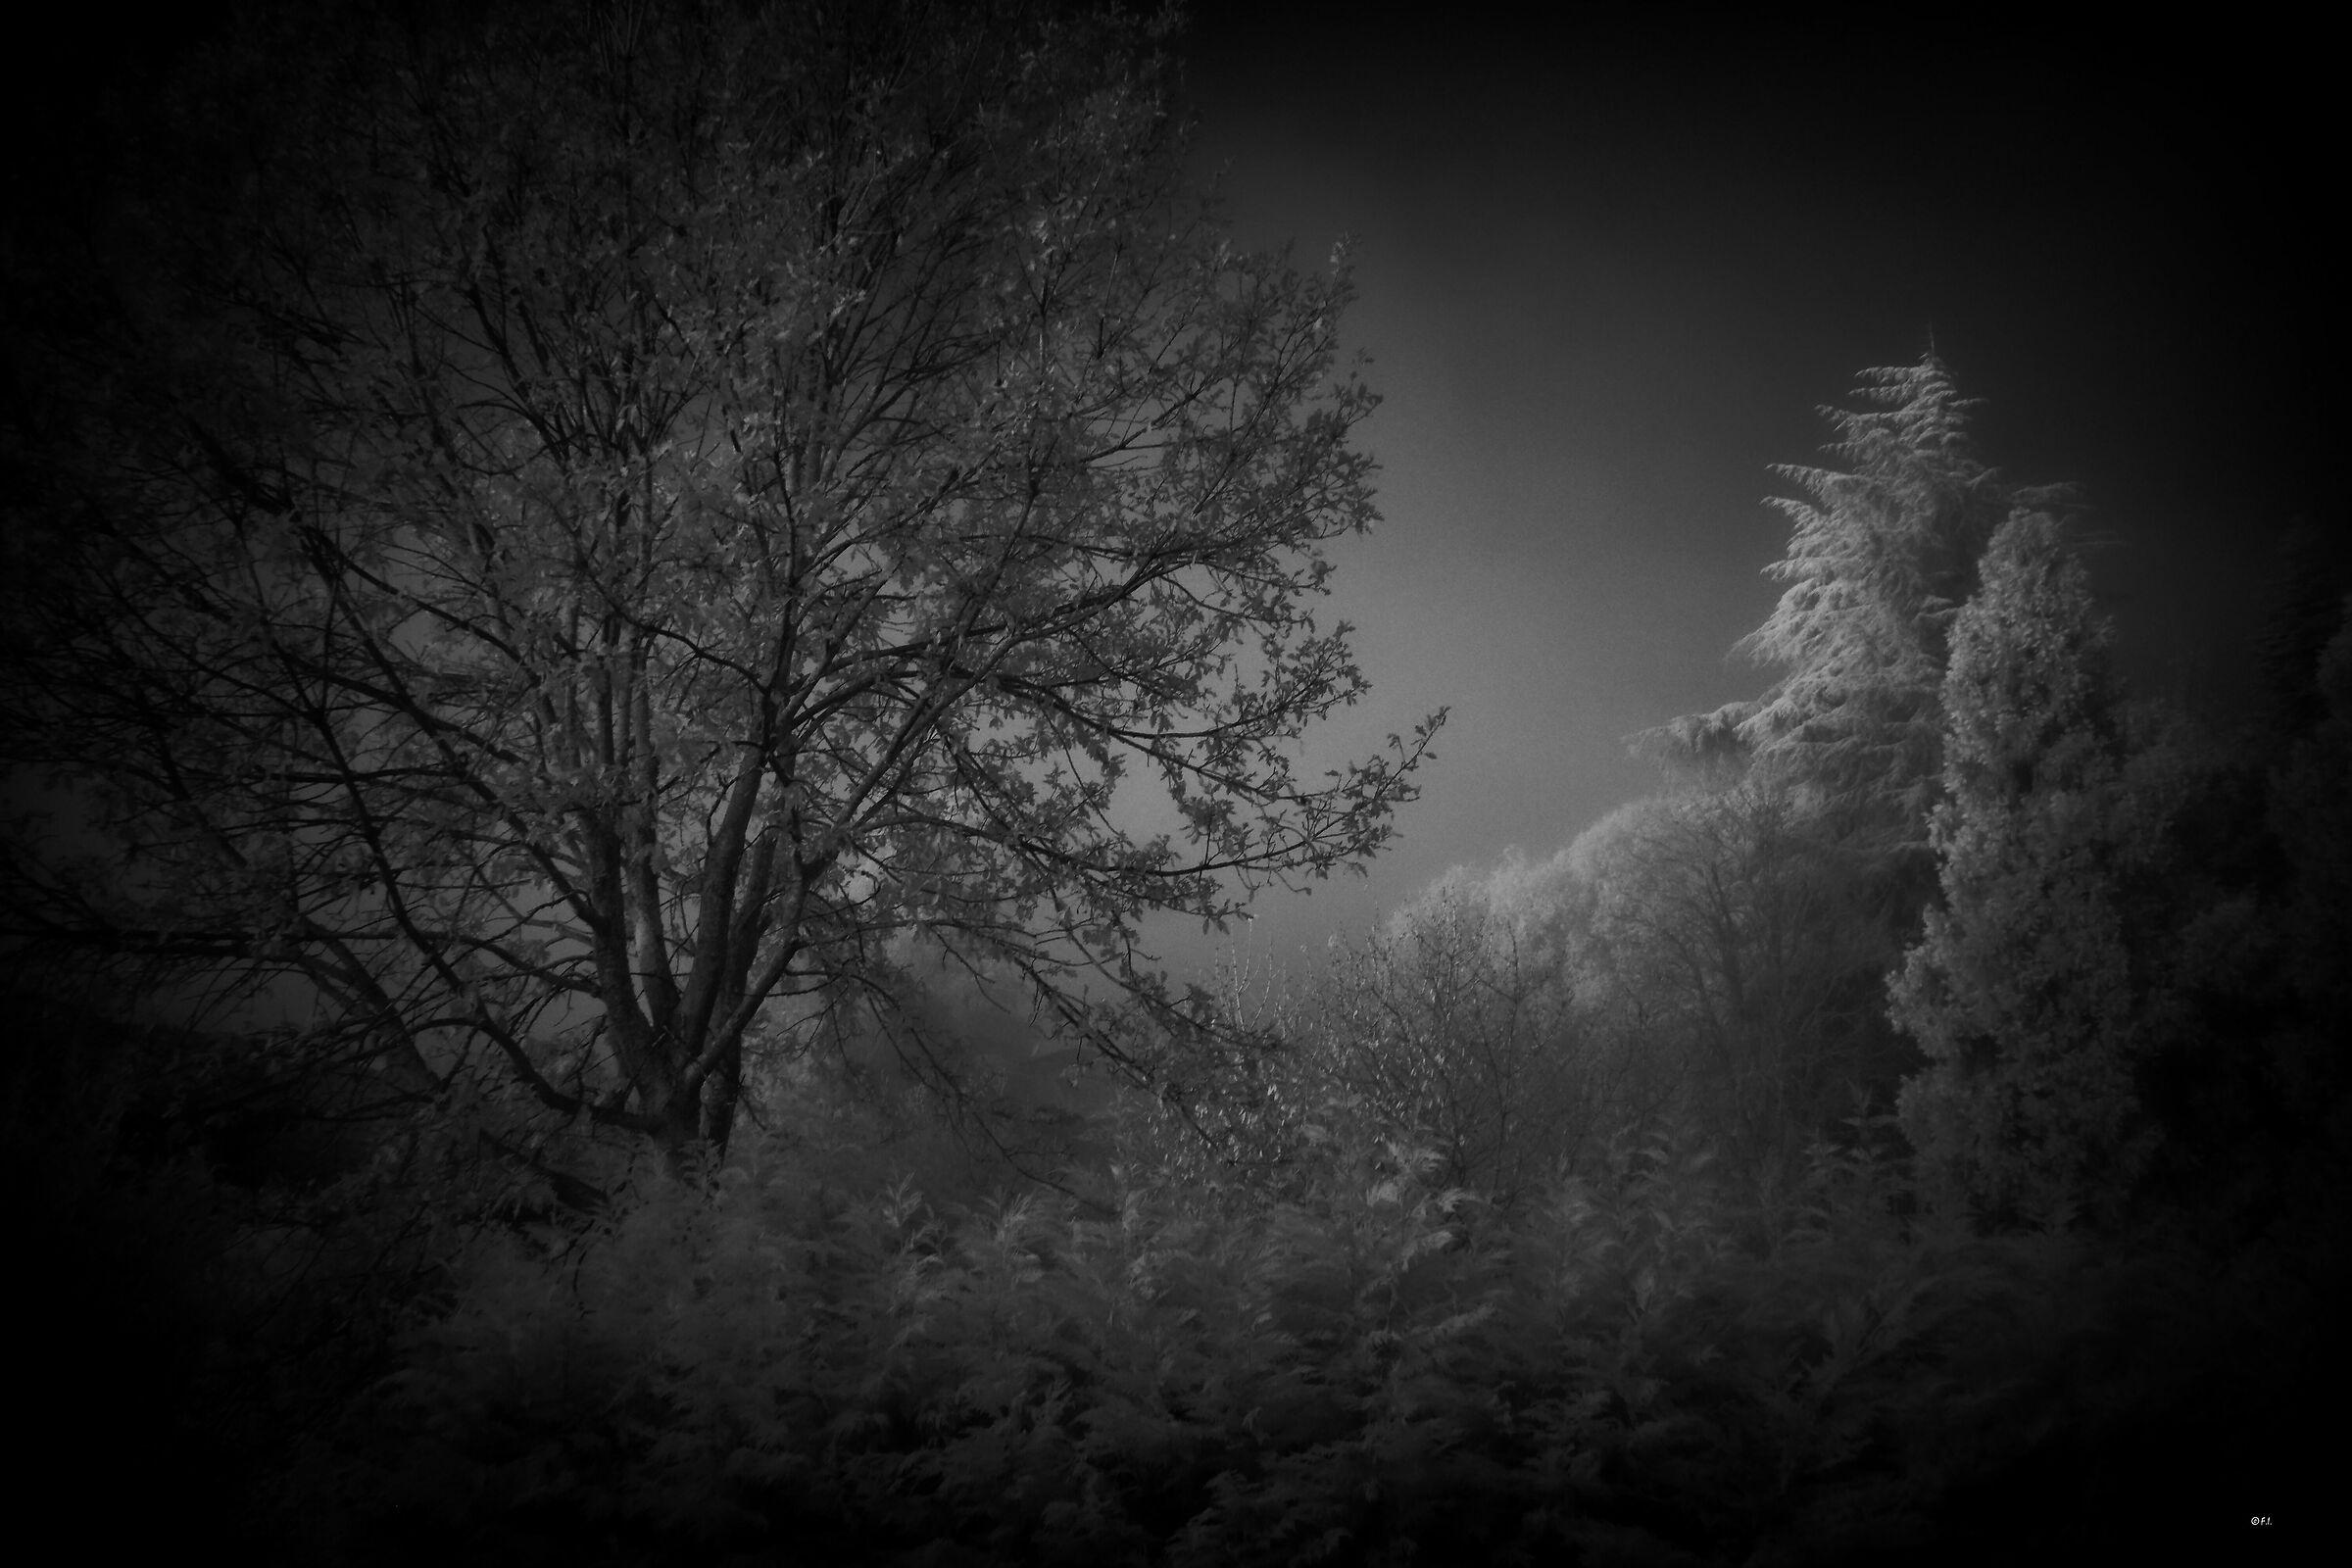 la nebbia mattutina...